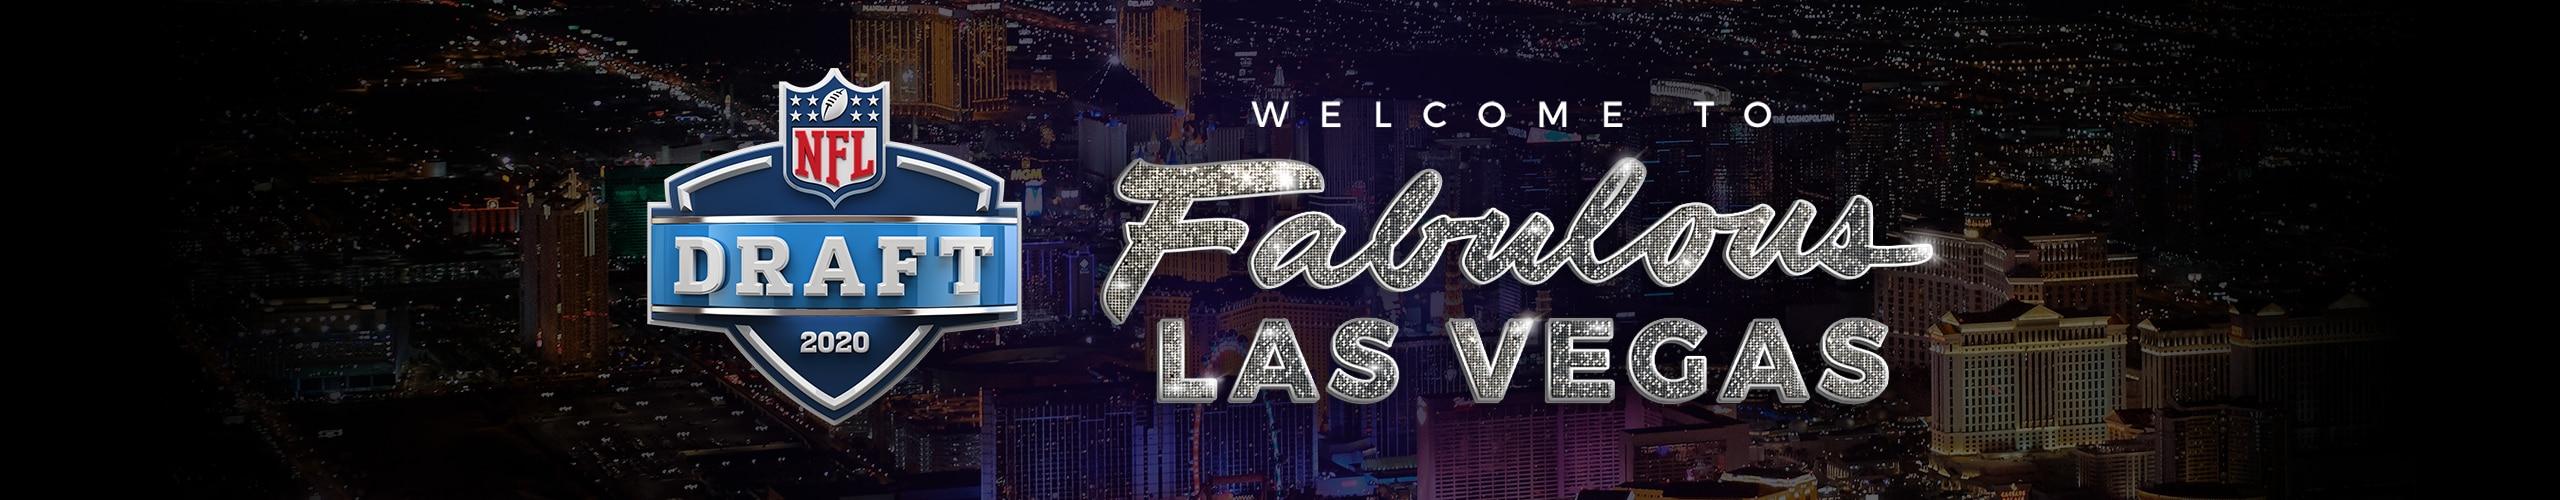 Nfl Combine 2020 Events.2020 Nfl Draft In Las Vegas Raiders Com